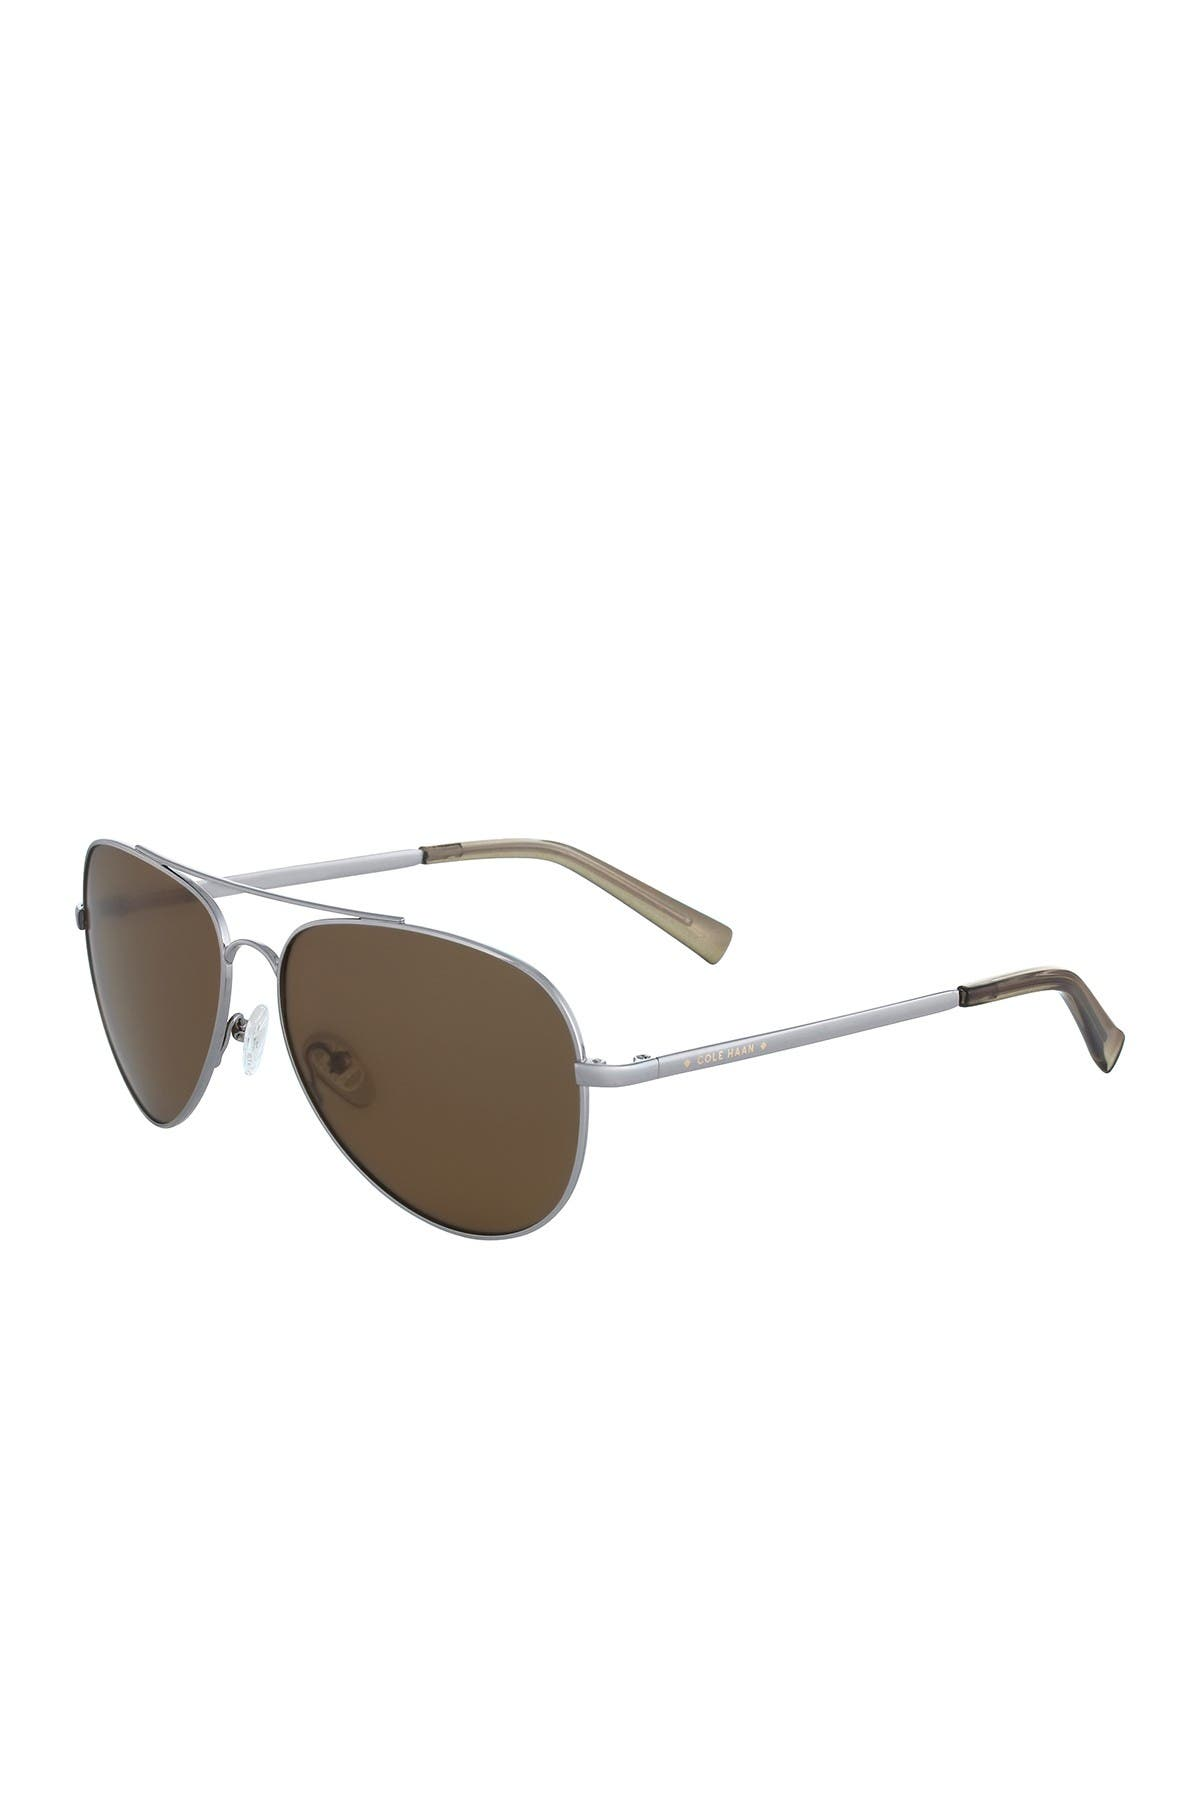 Image of Cole Haan 60mm Aviator Sunglasses